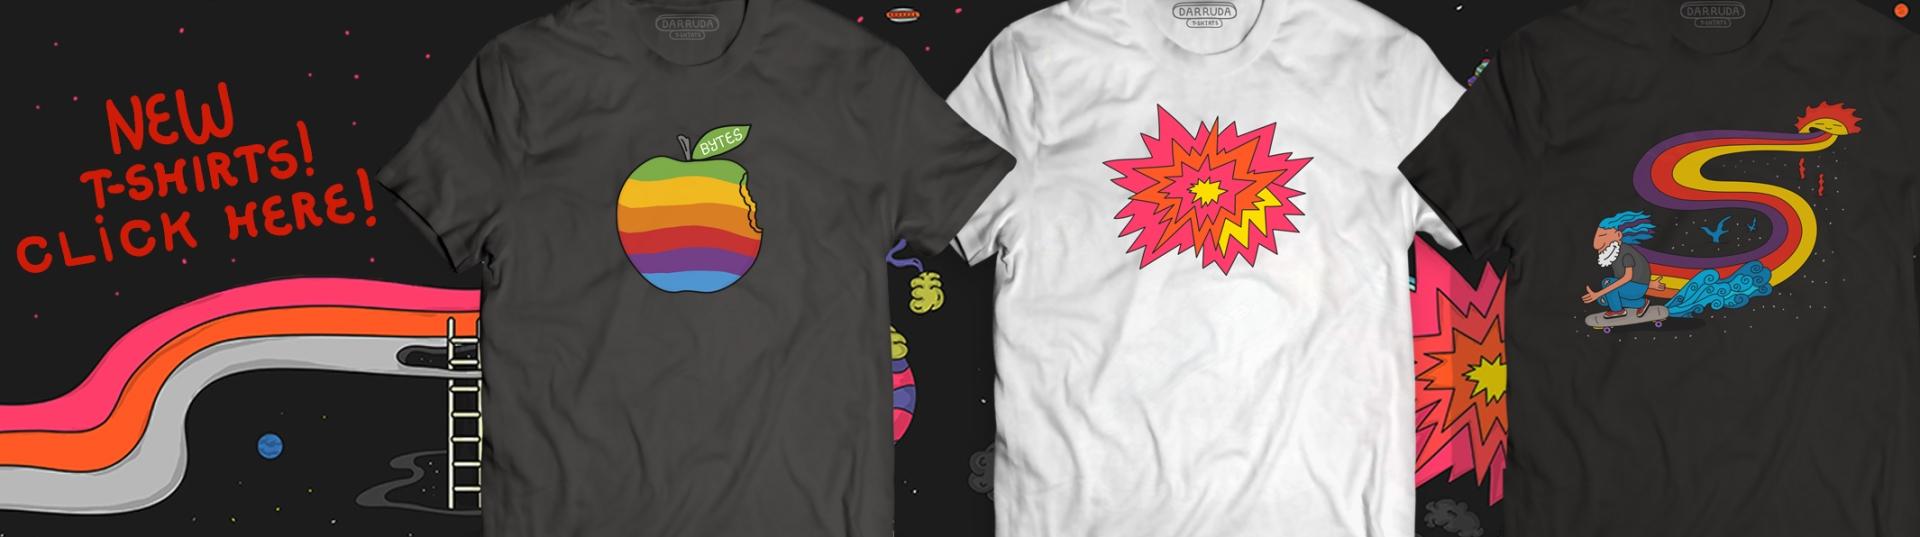 videogames_tshirts_banner1